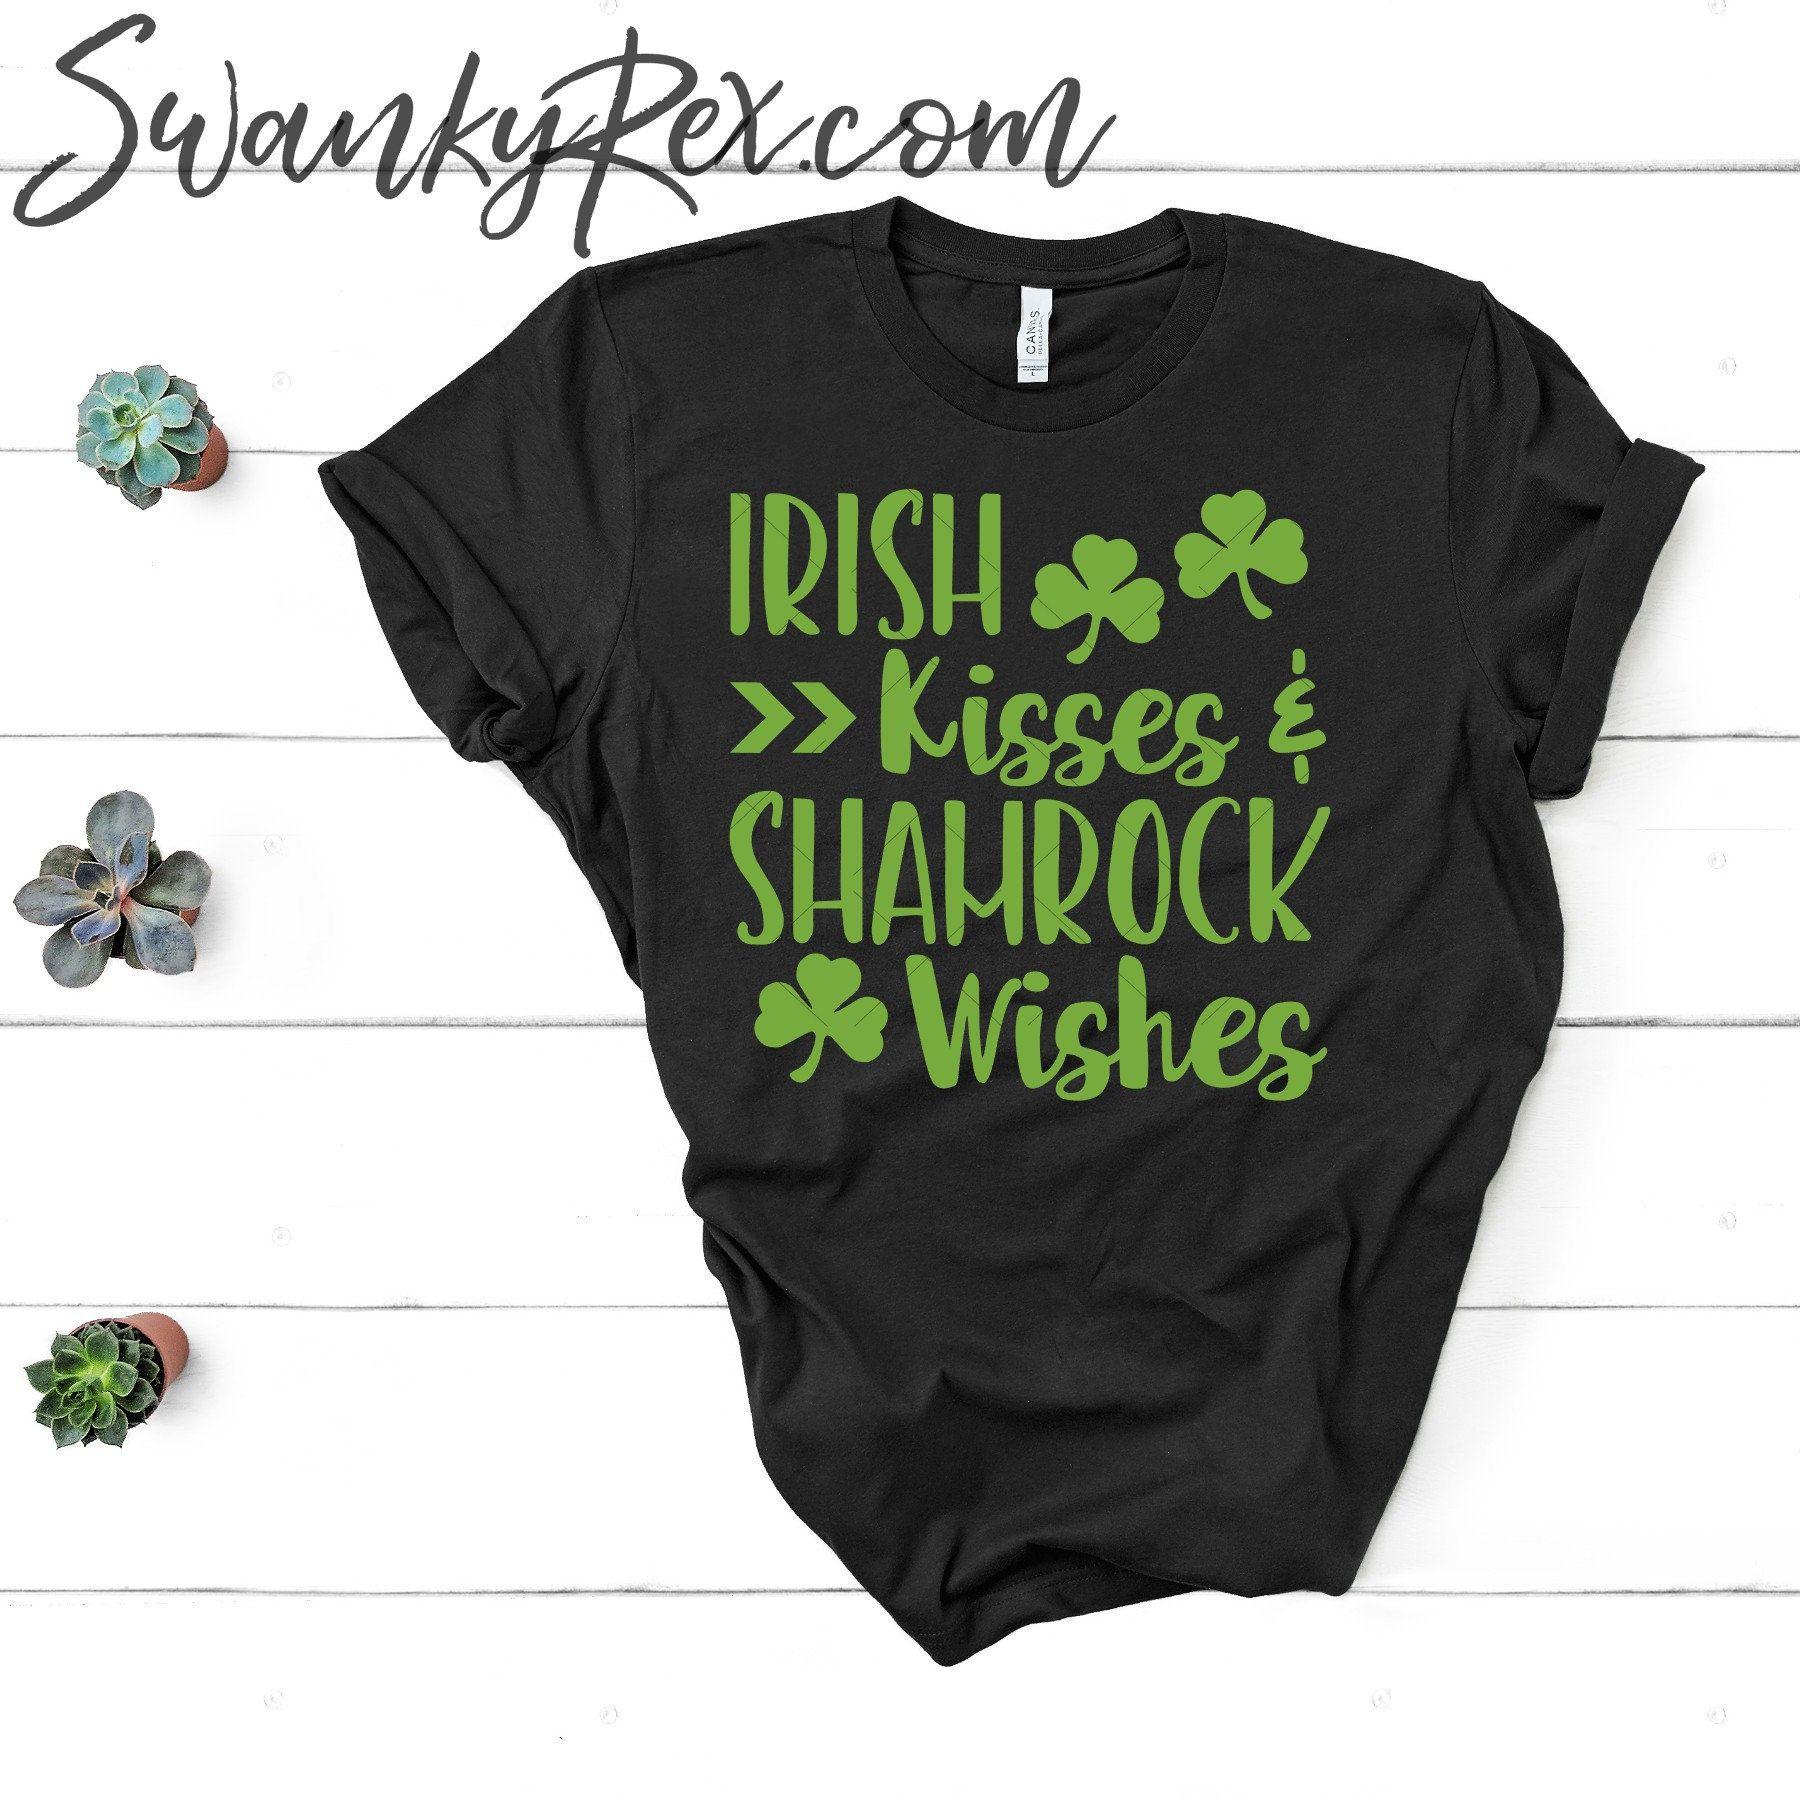 d1b03015 Irish Kiss & Shamrock Wishes| St. Patrick's Day T-Shirt| St. Patty's Shirt|  Clover| Cute| Green| Gray| Grey| List| Women's| Ladies| Soft| T